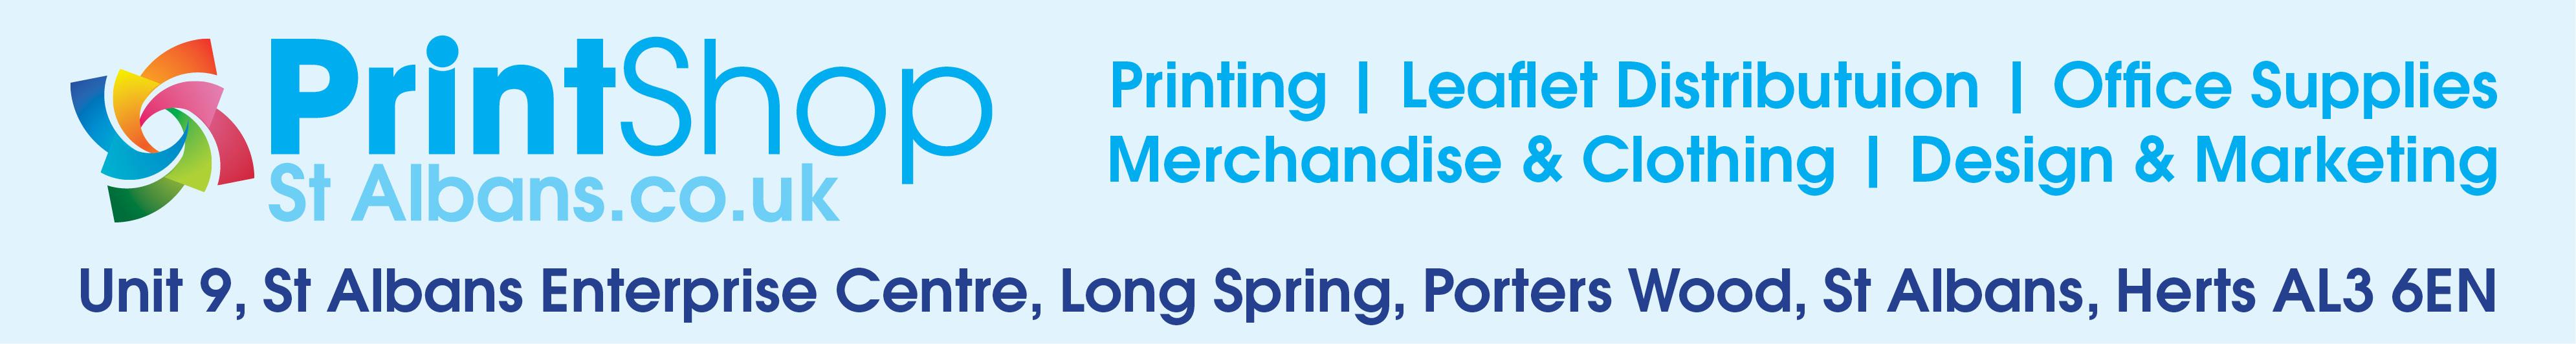 Print Shop St Albans leaflets business cards posters